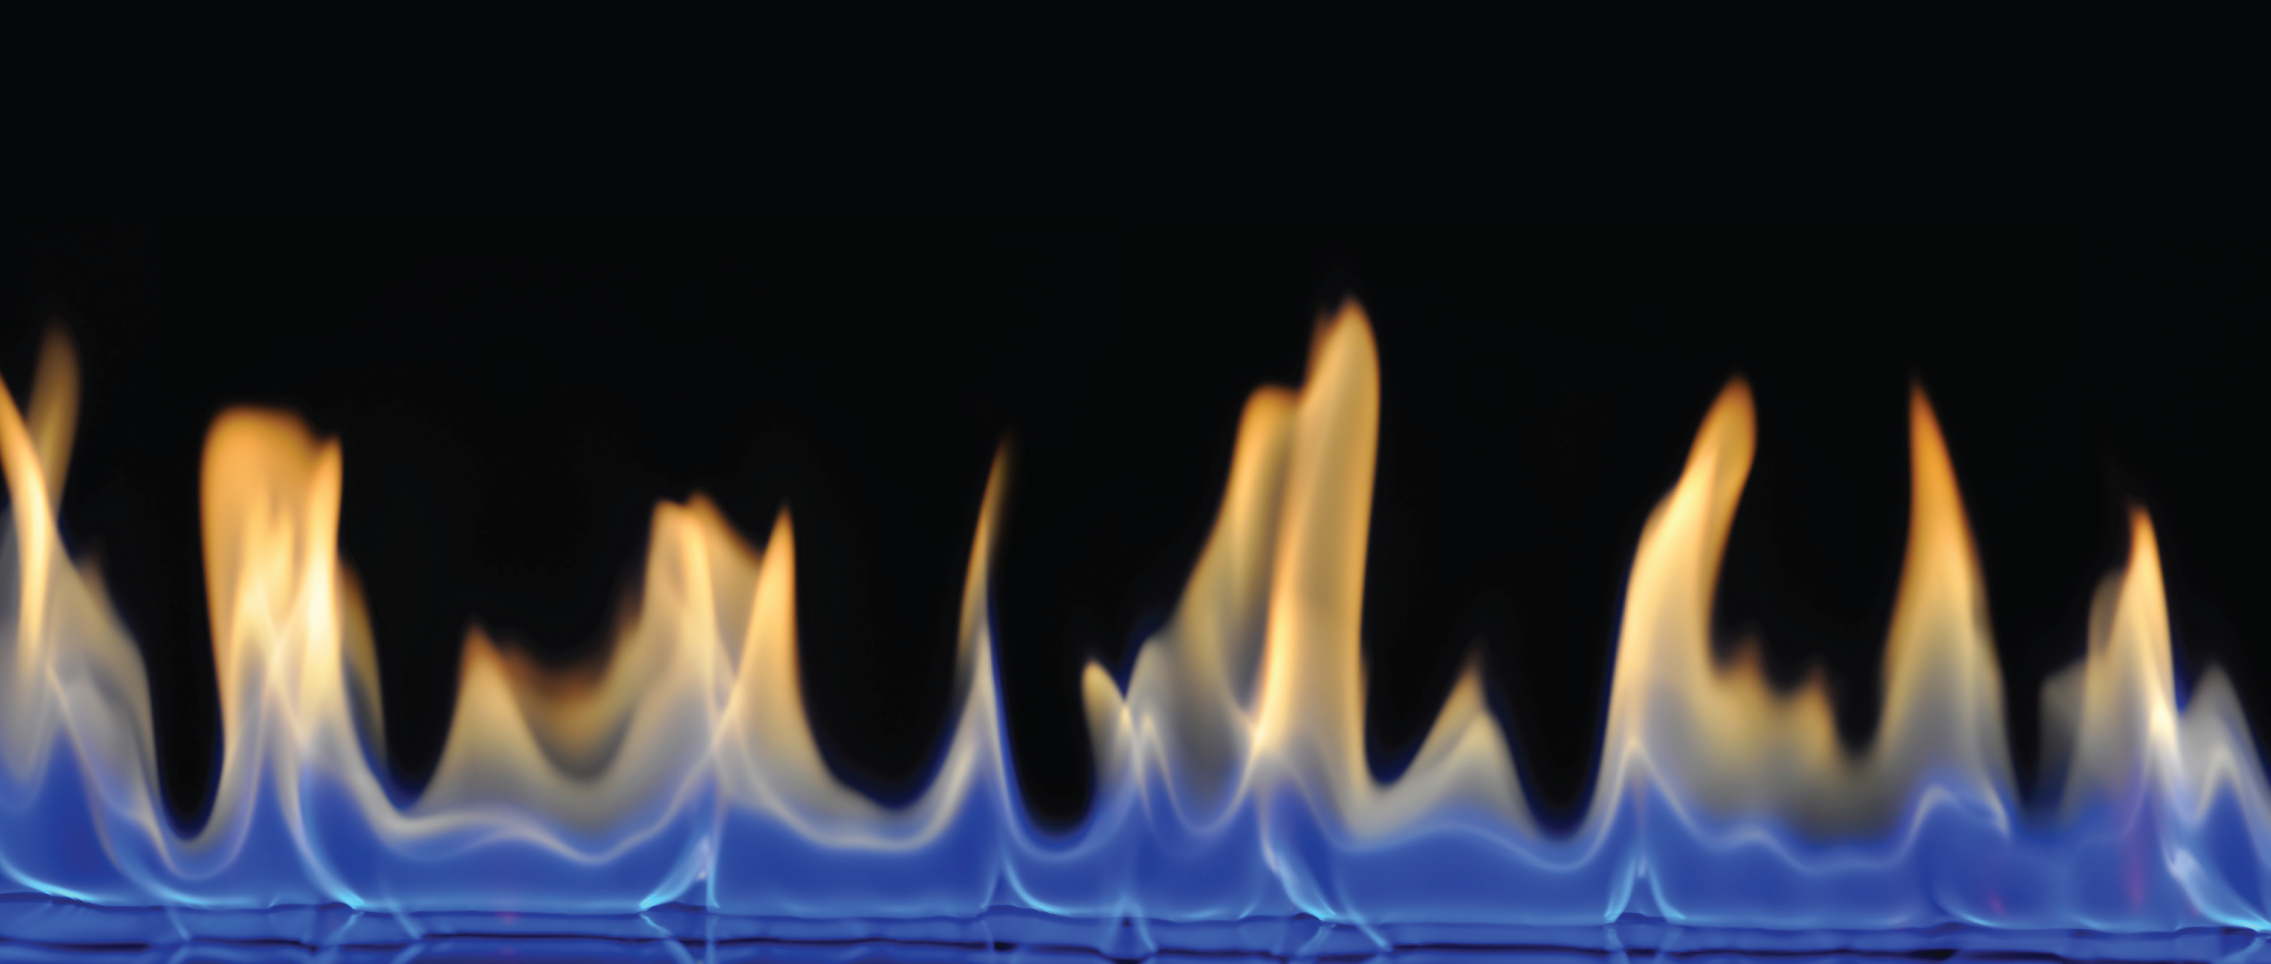 Ranieri Hanley & Hodek, PLC    Oil & Gas    Learn More